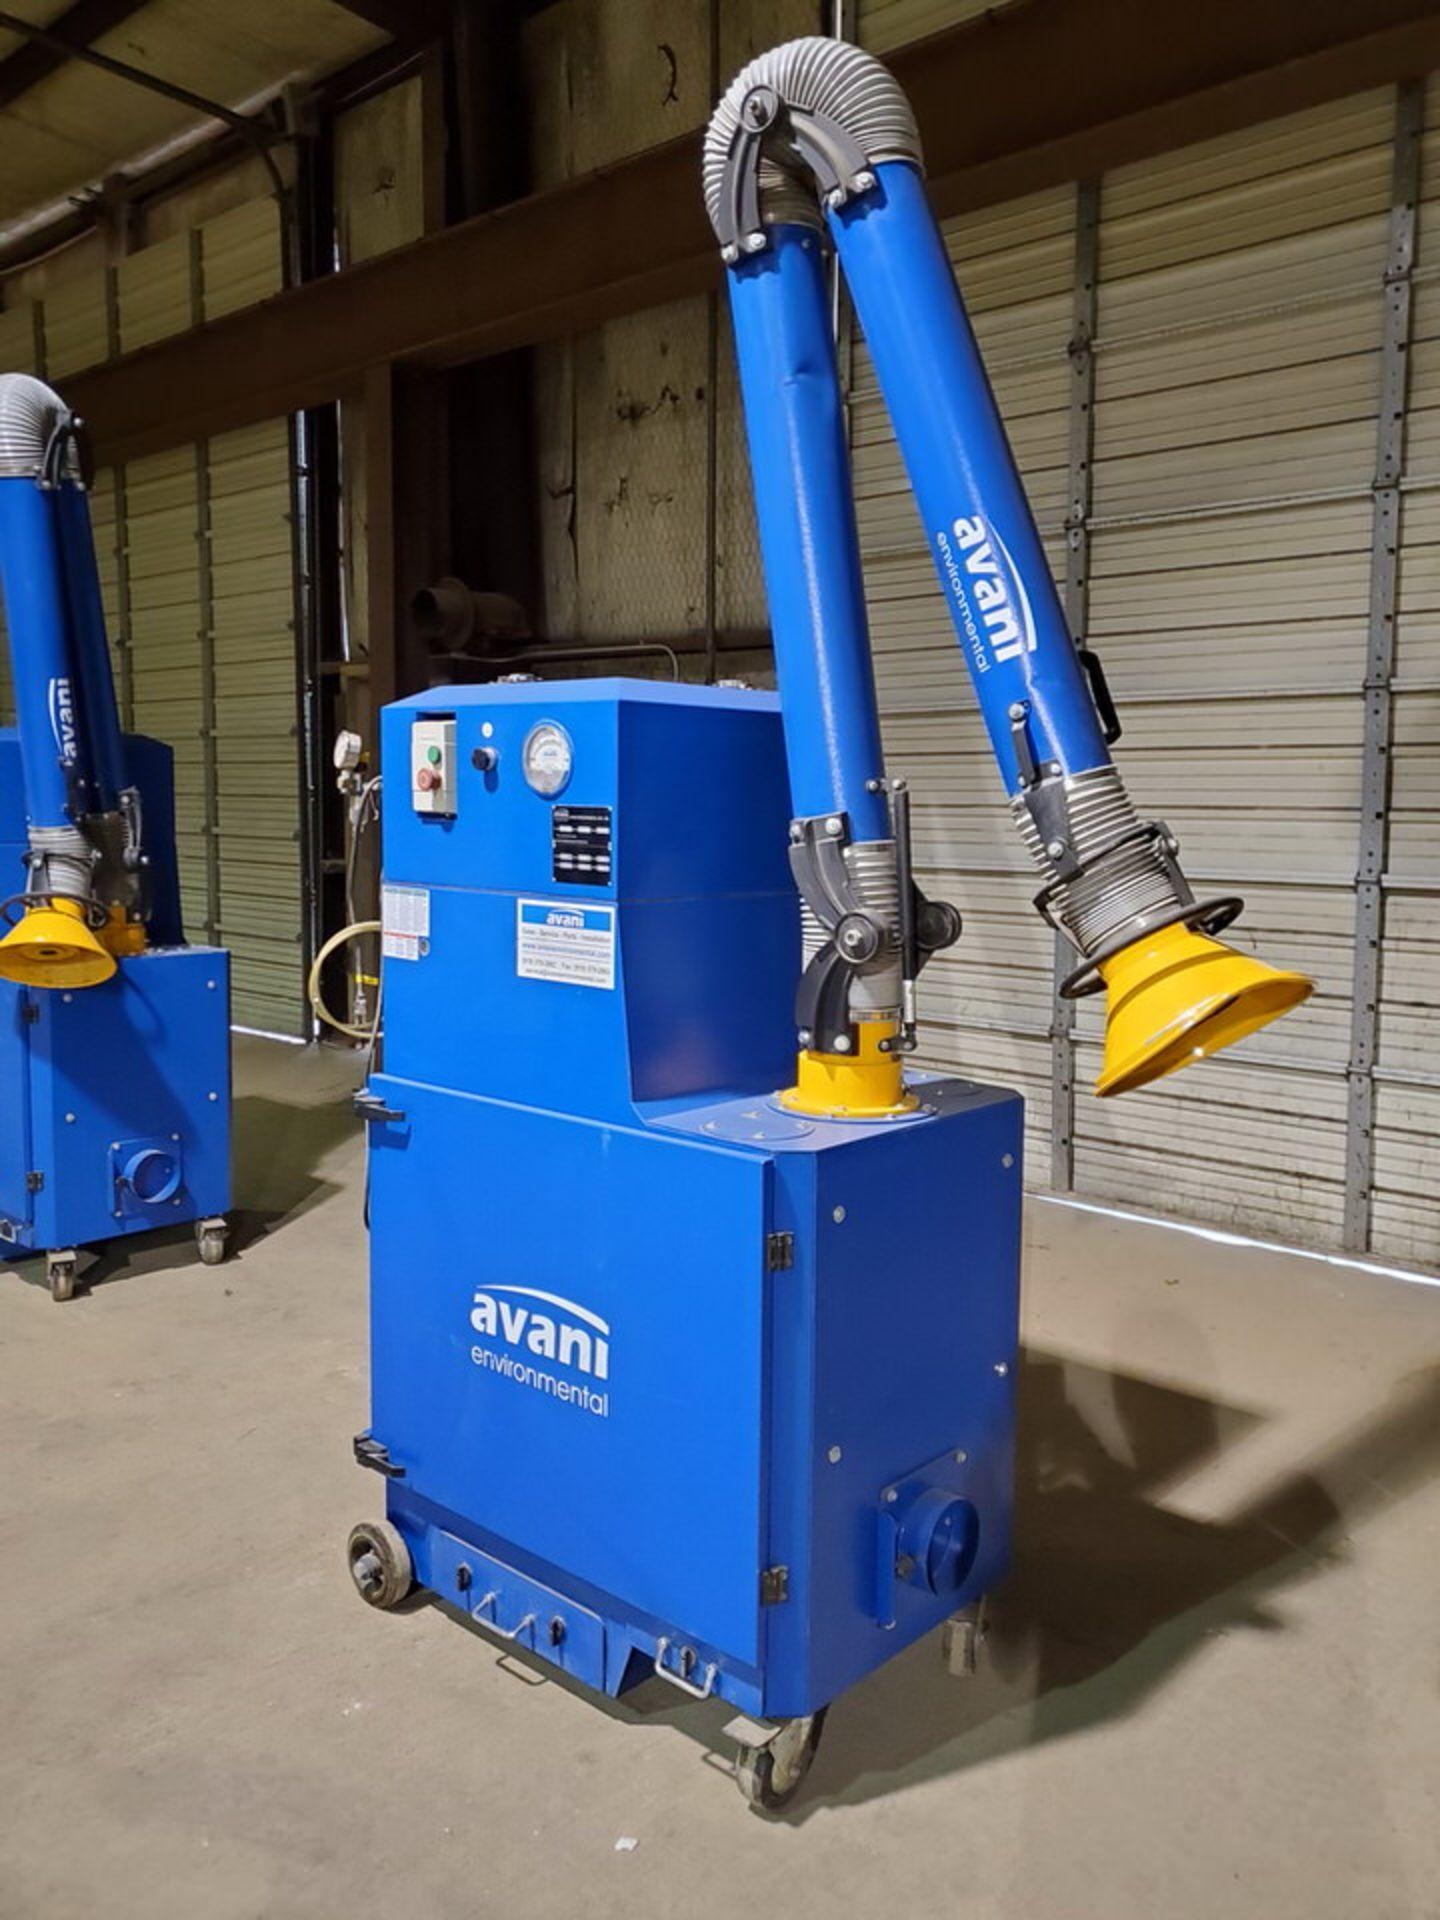 2017 Avanti SPC-2000 Portable Dust Collector 1-1/2HP, 120V, 60HZ, 1PH, 14A, 3450RPM - Image 4 of 7